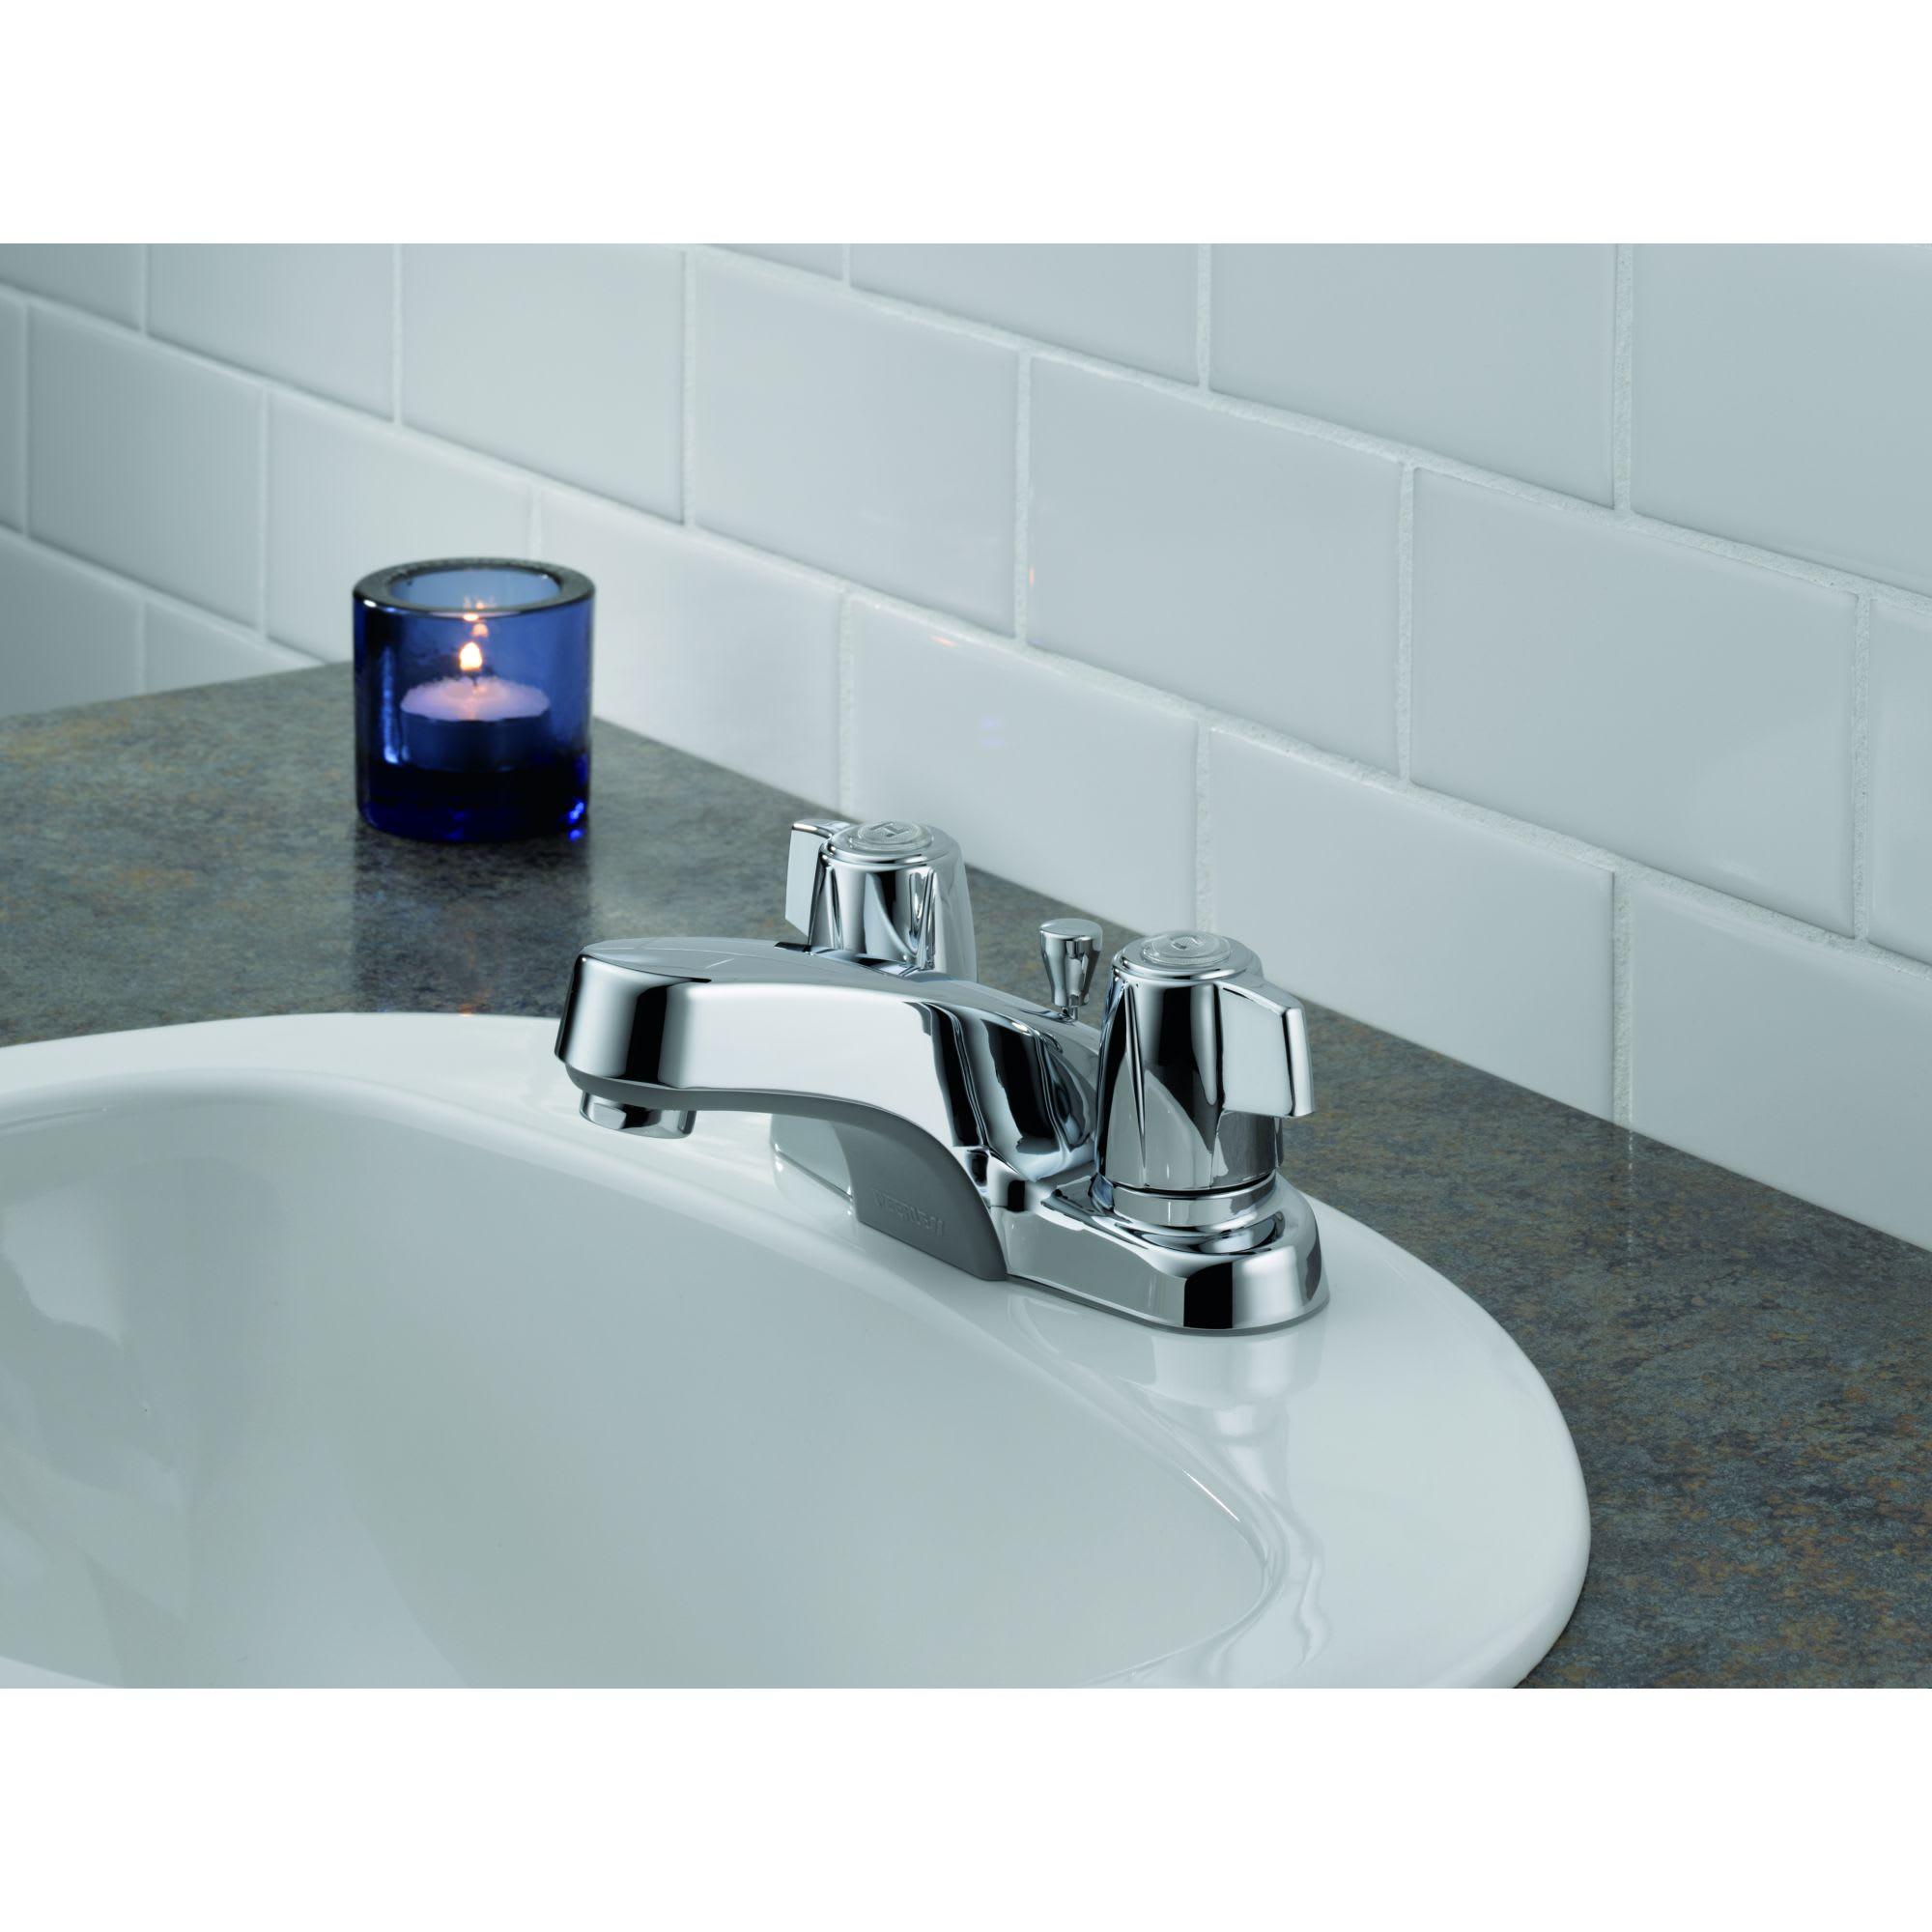 Amazing Peerless Faucet Composition - Bathtub Ideas - dilata.info